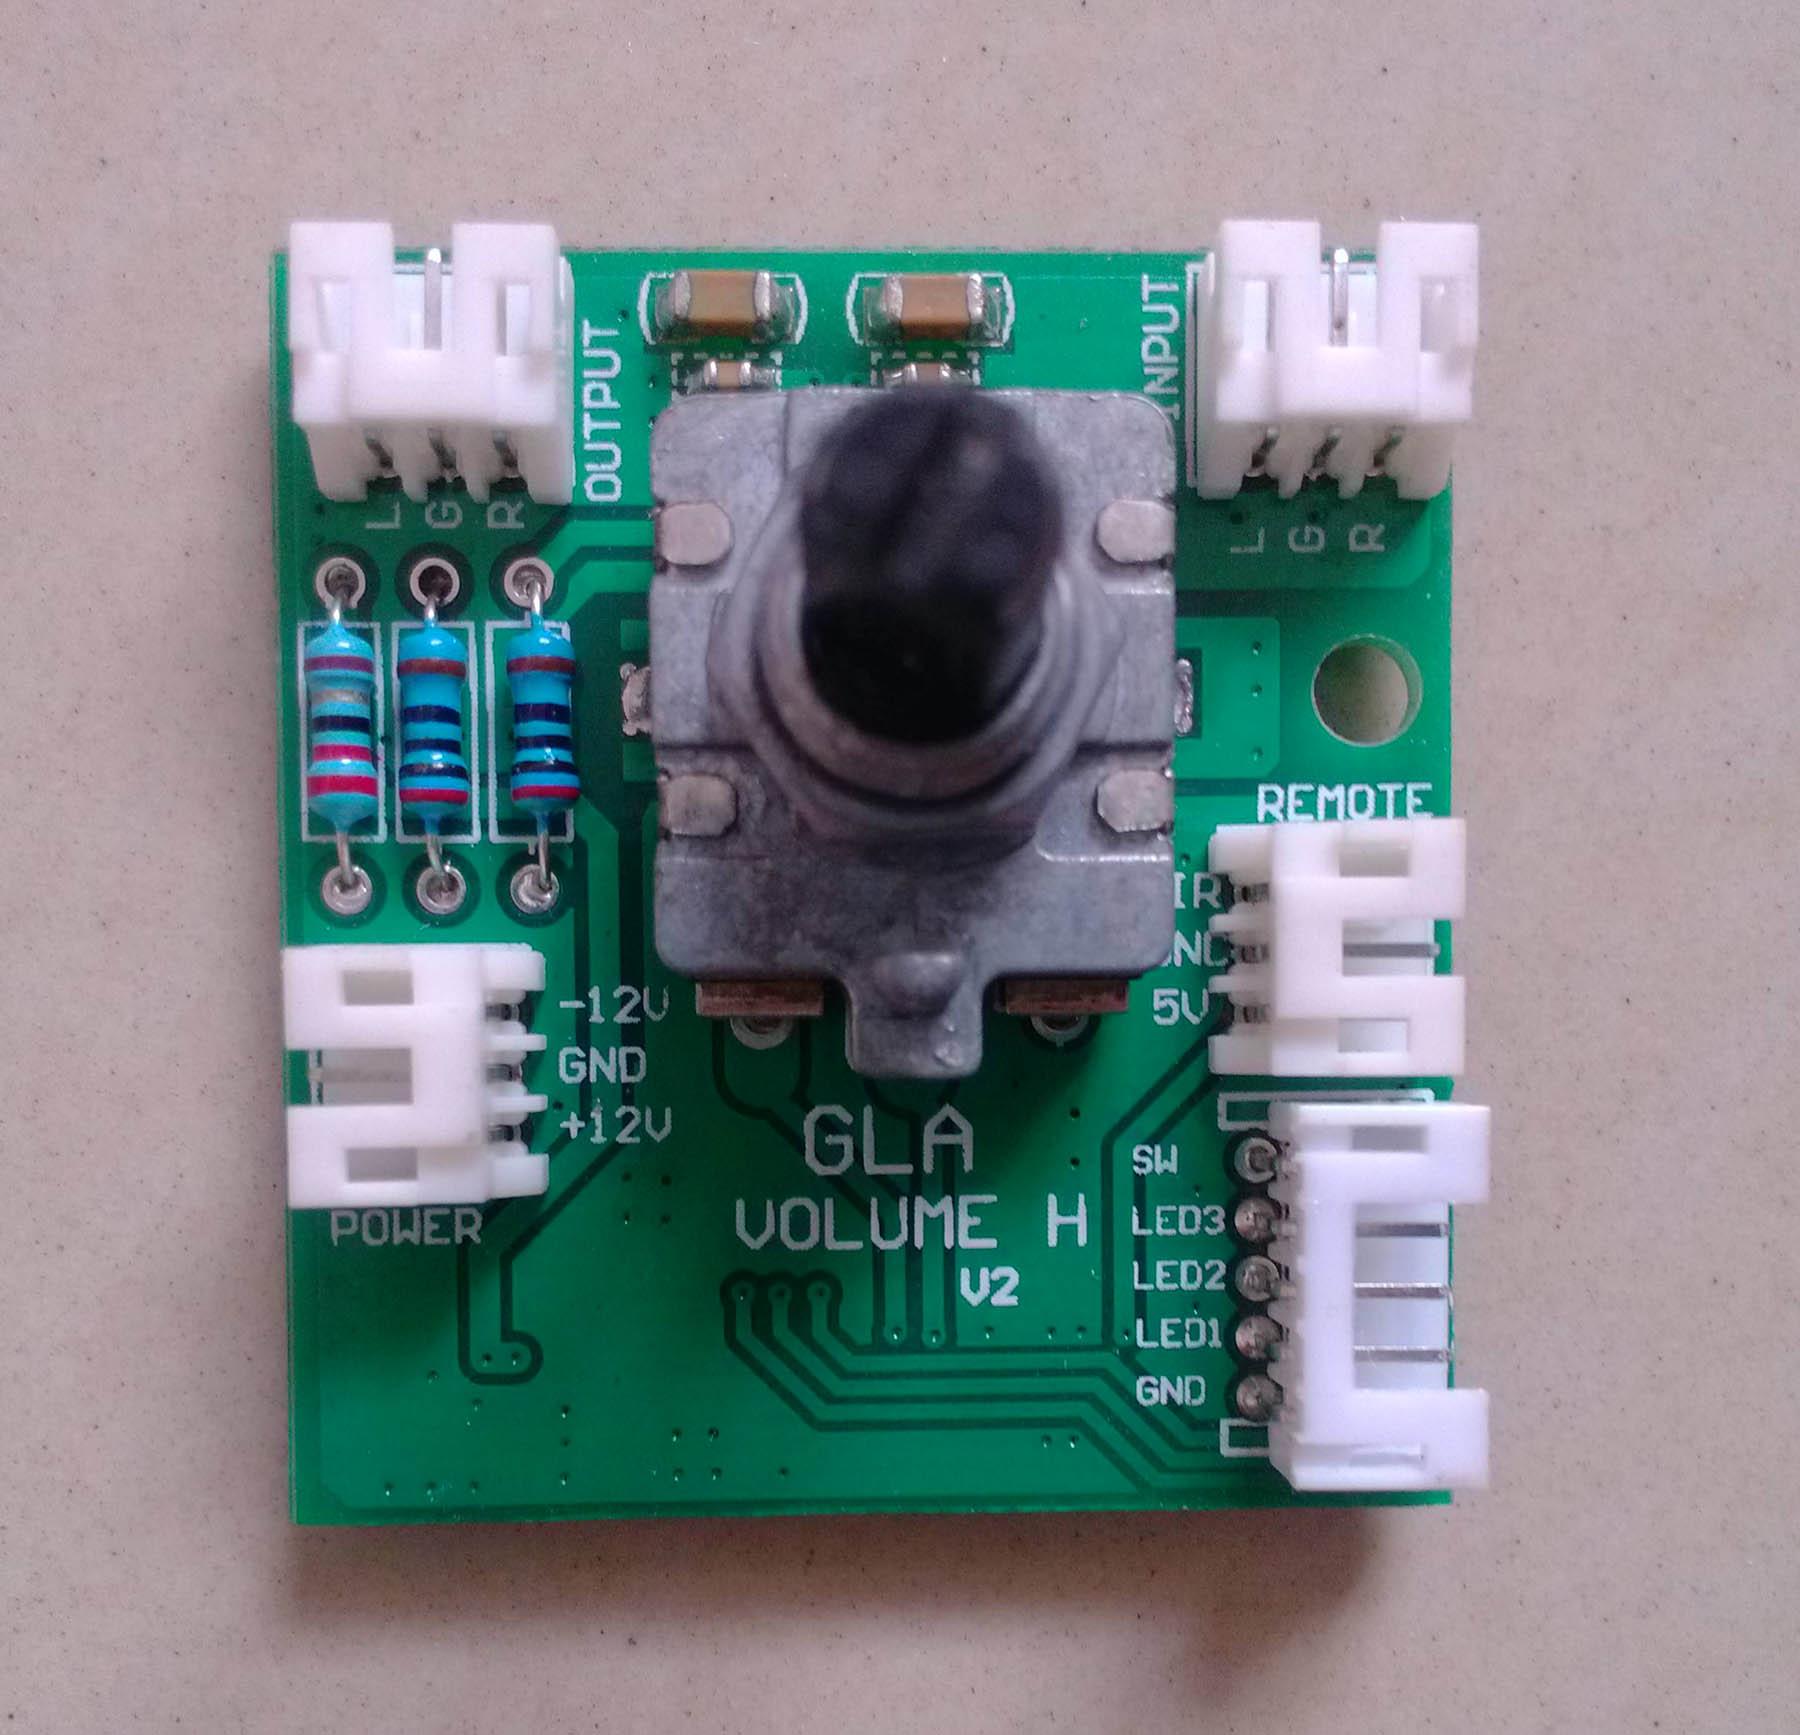 HIFI  高级音量控制板 遥控音量电位器 电位器升级长寿命 (可显示